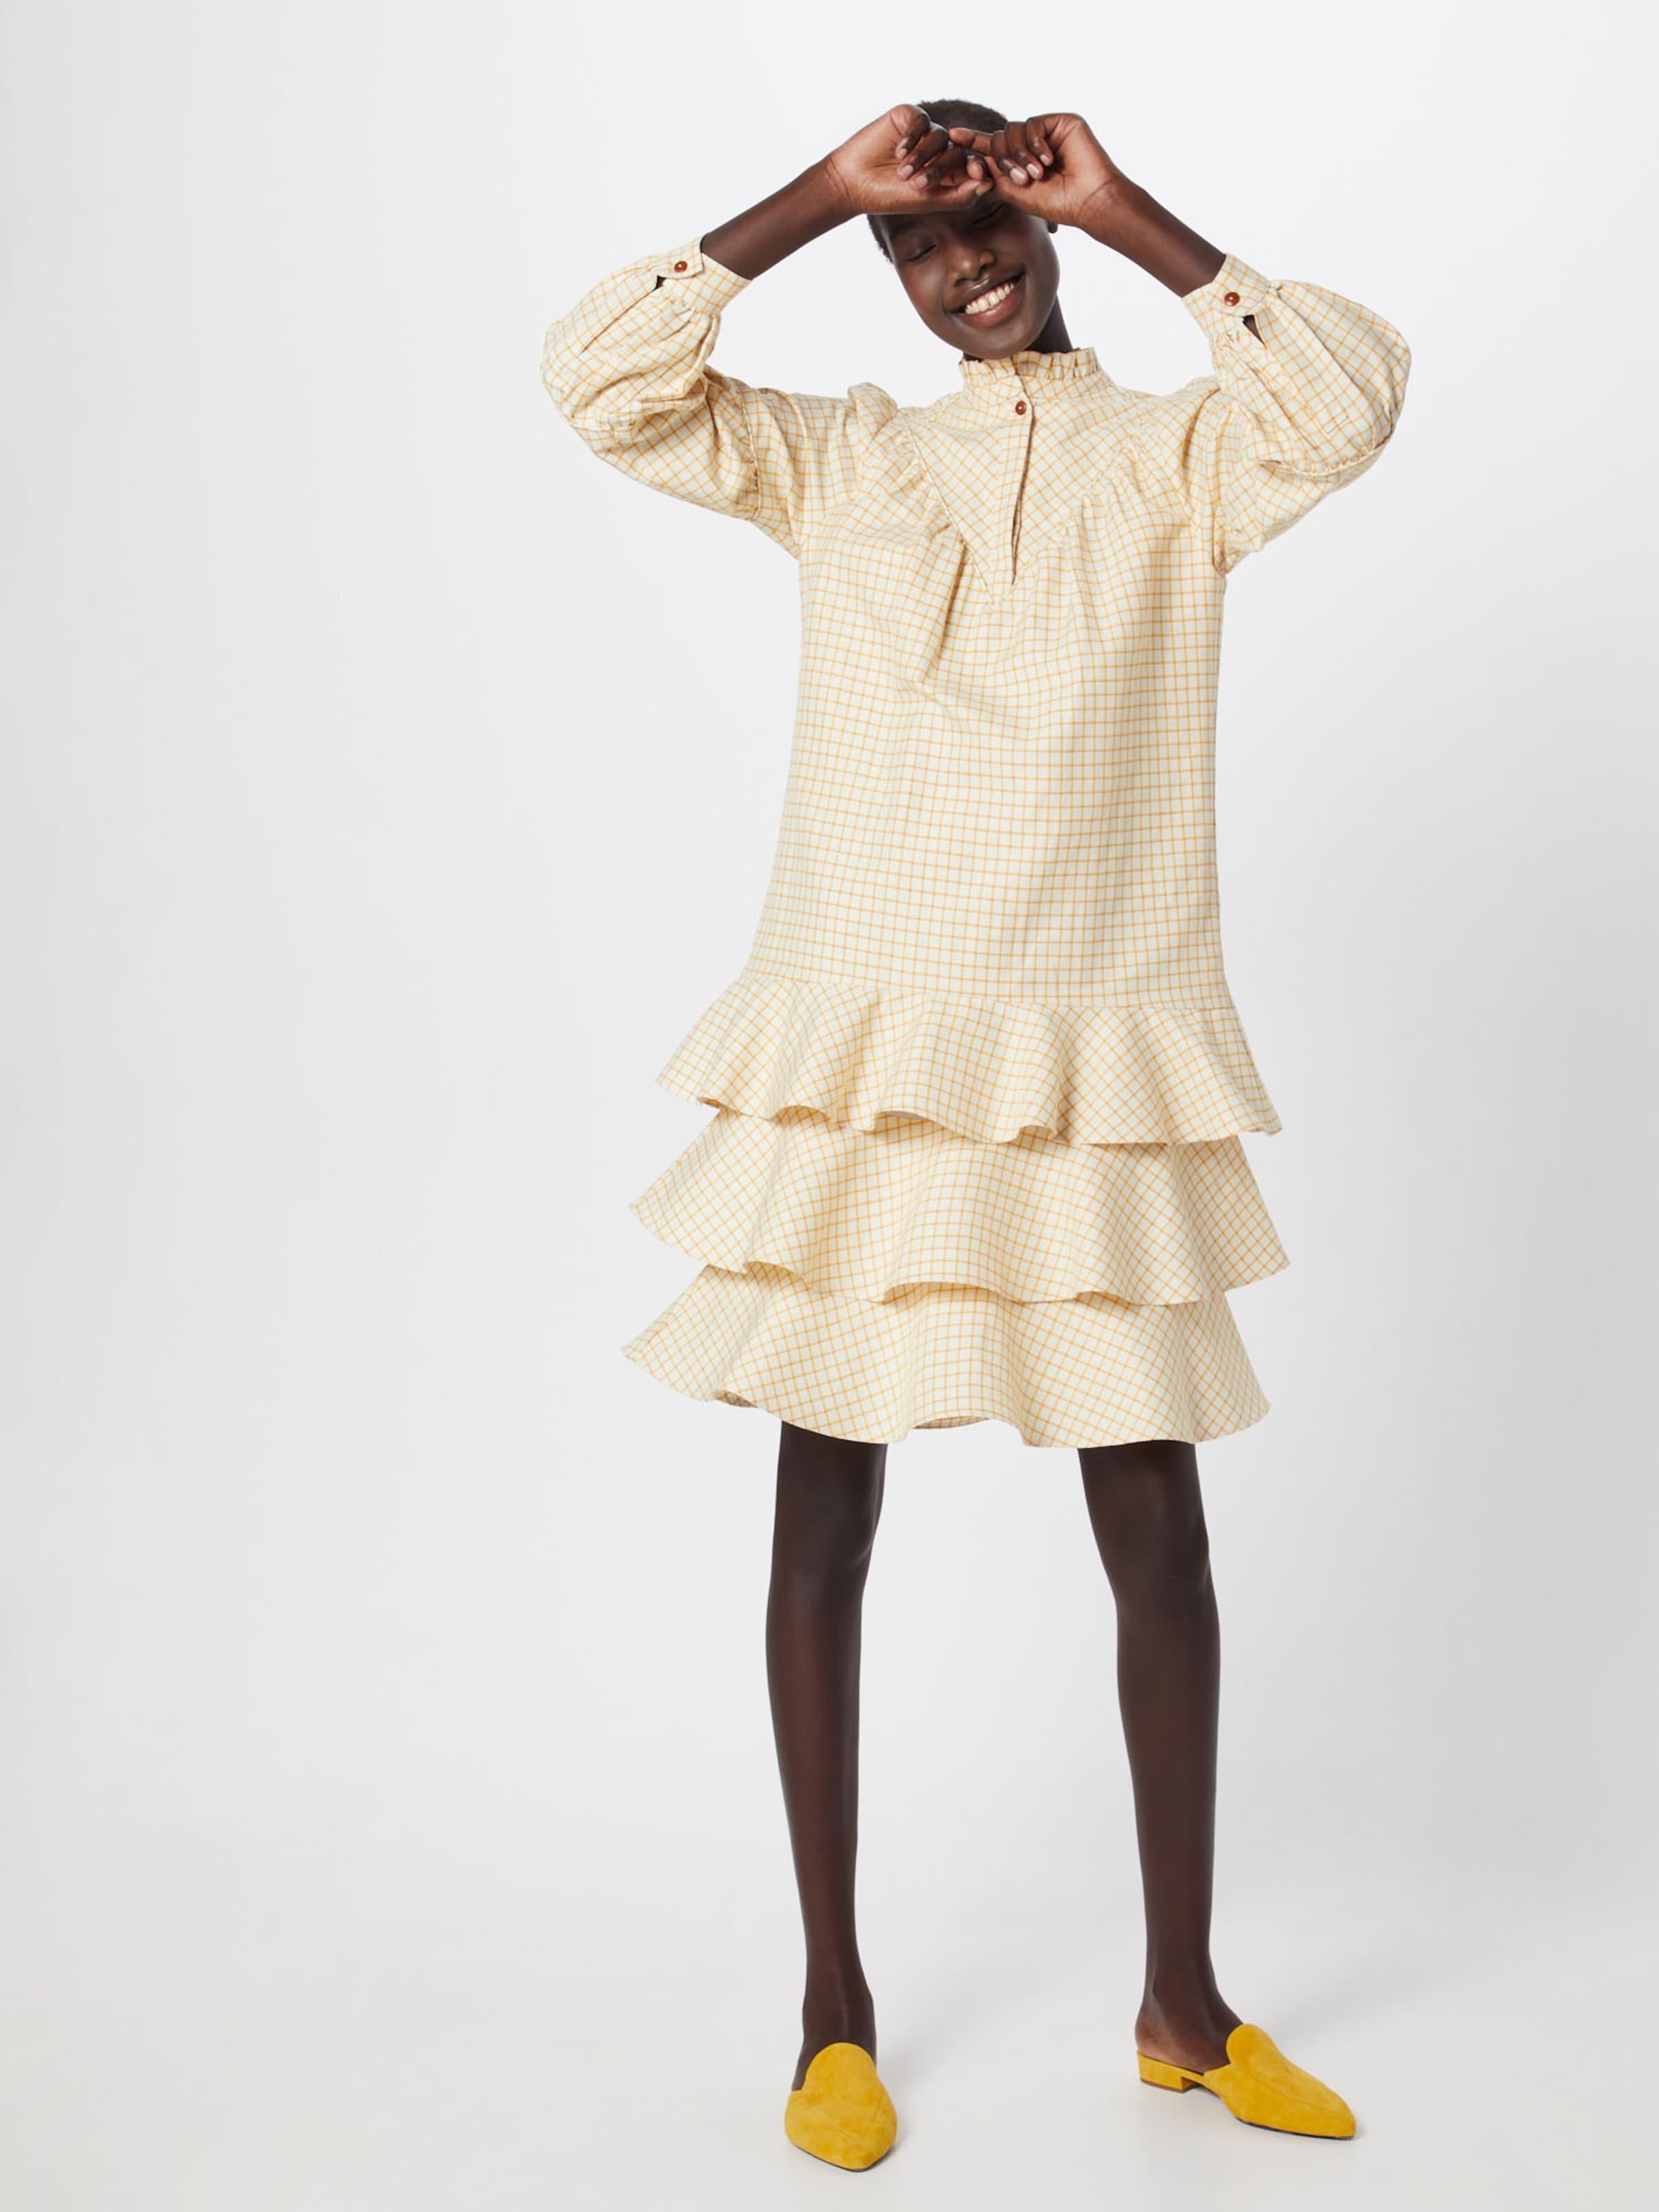 In Kleid In BeigeGoldgelb Kleid Postyr Postyr In Kleid Postyr Kleid BeigeGoldgelb BeigeGoldgelb Postyr 8nvw0ymNO